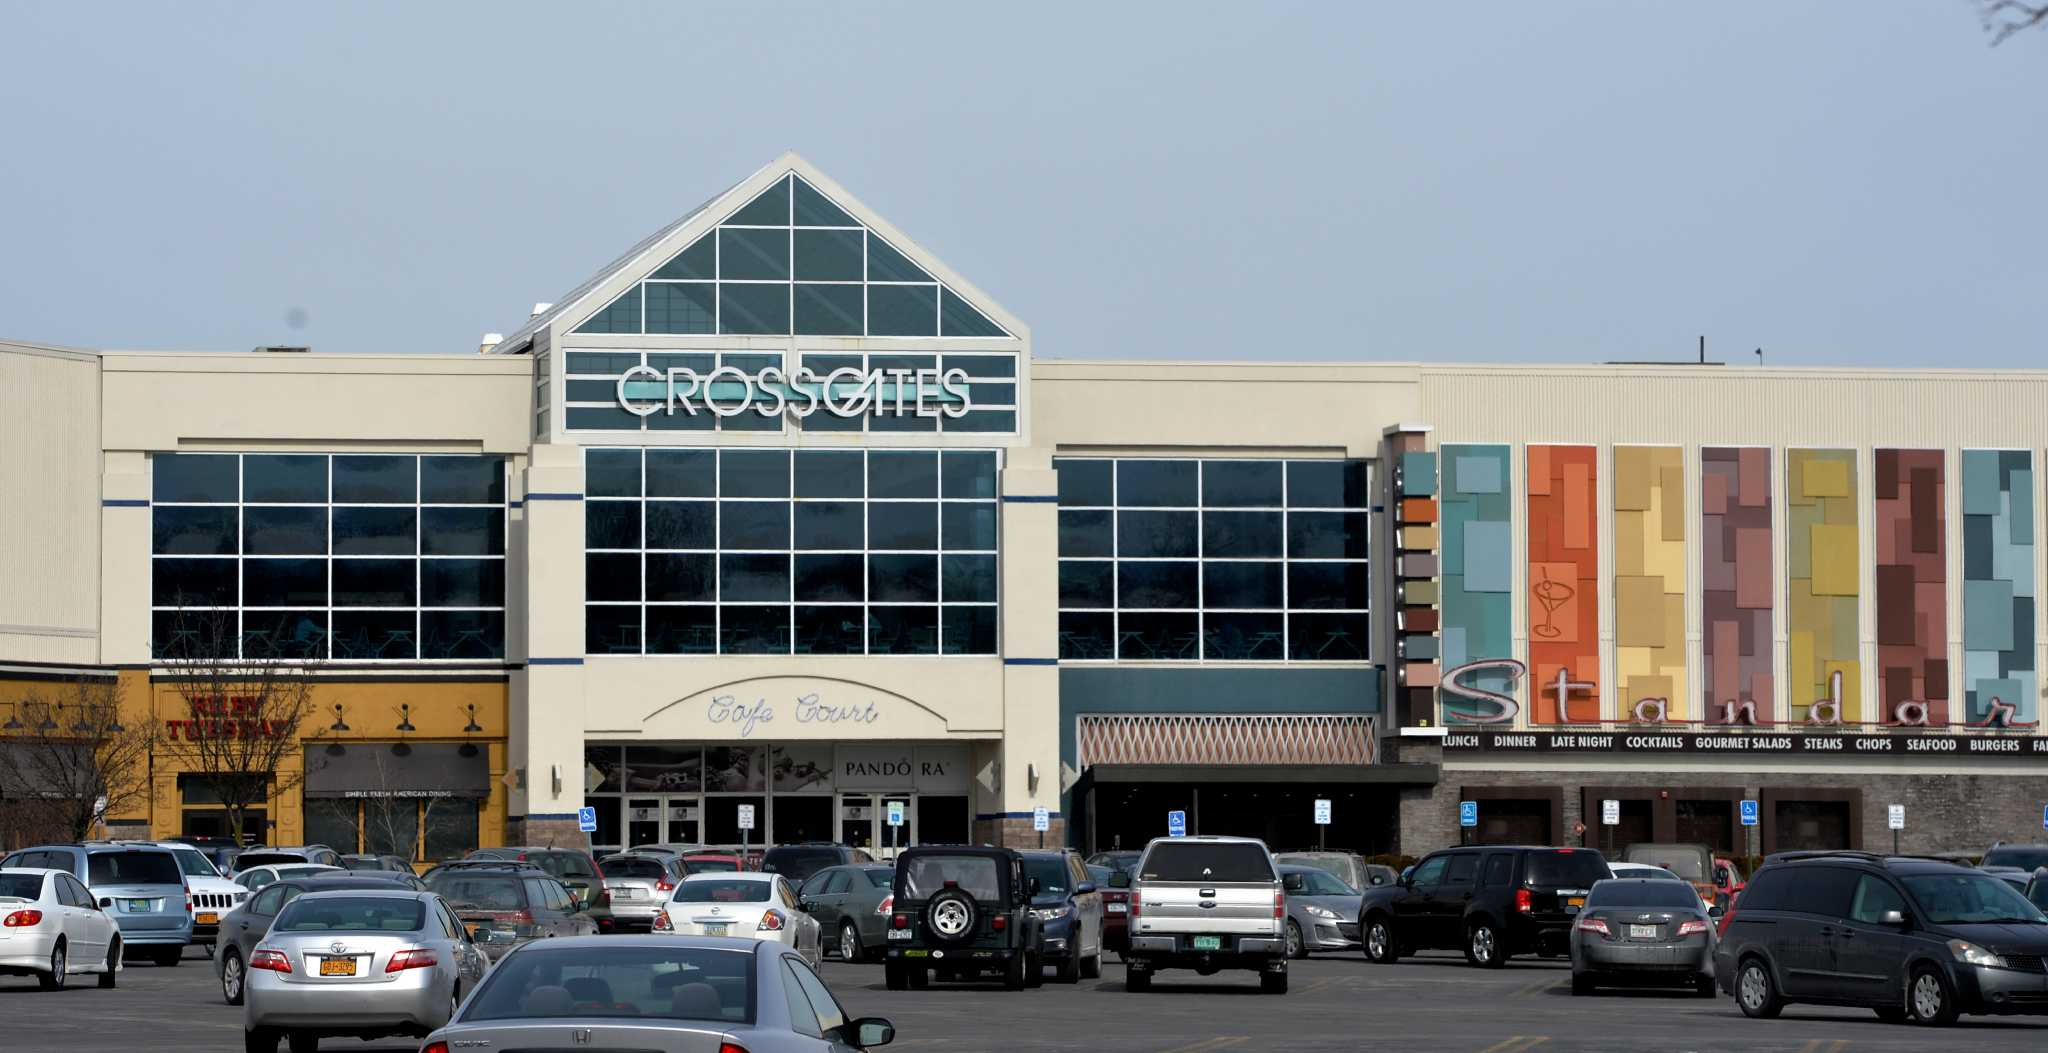 Fullsize Of Crossgates Mall Stores